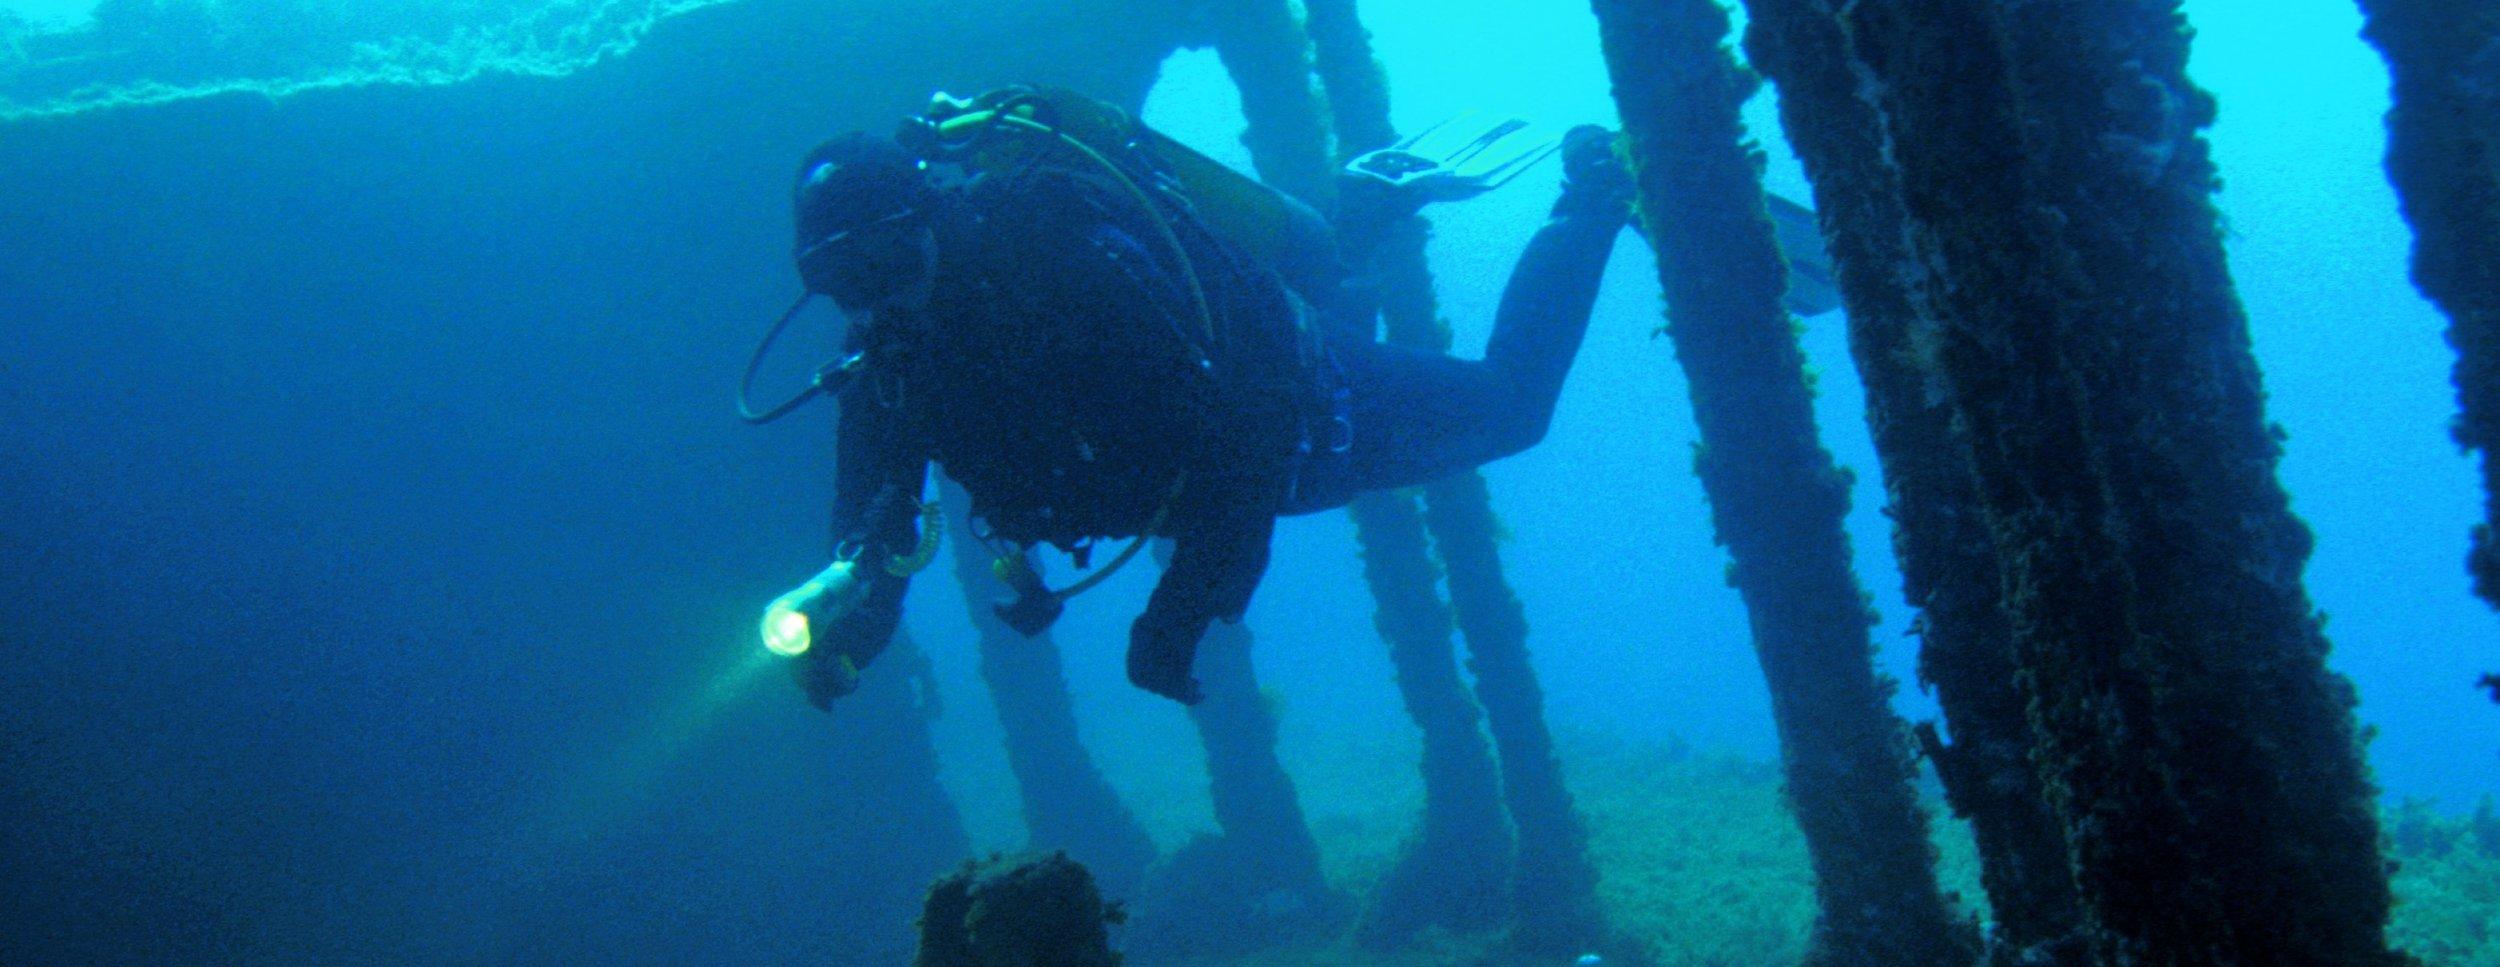 Diving_14.jpg